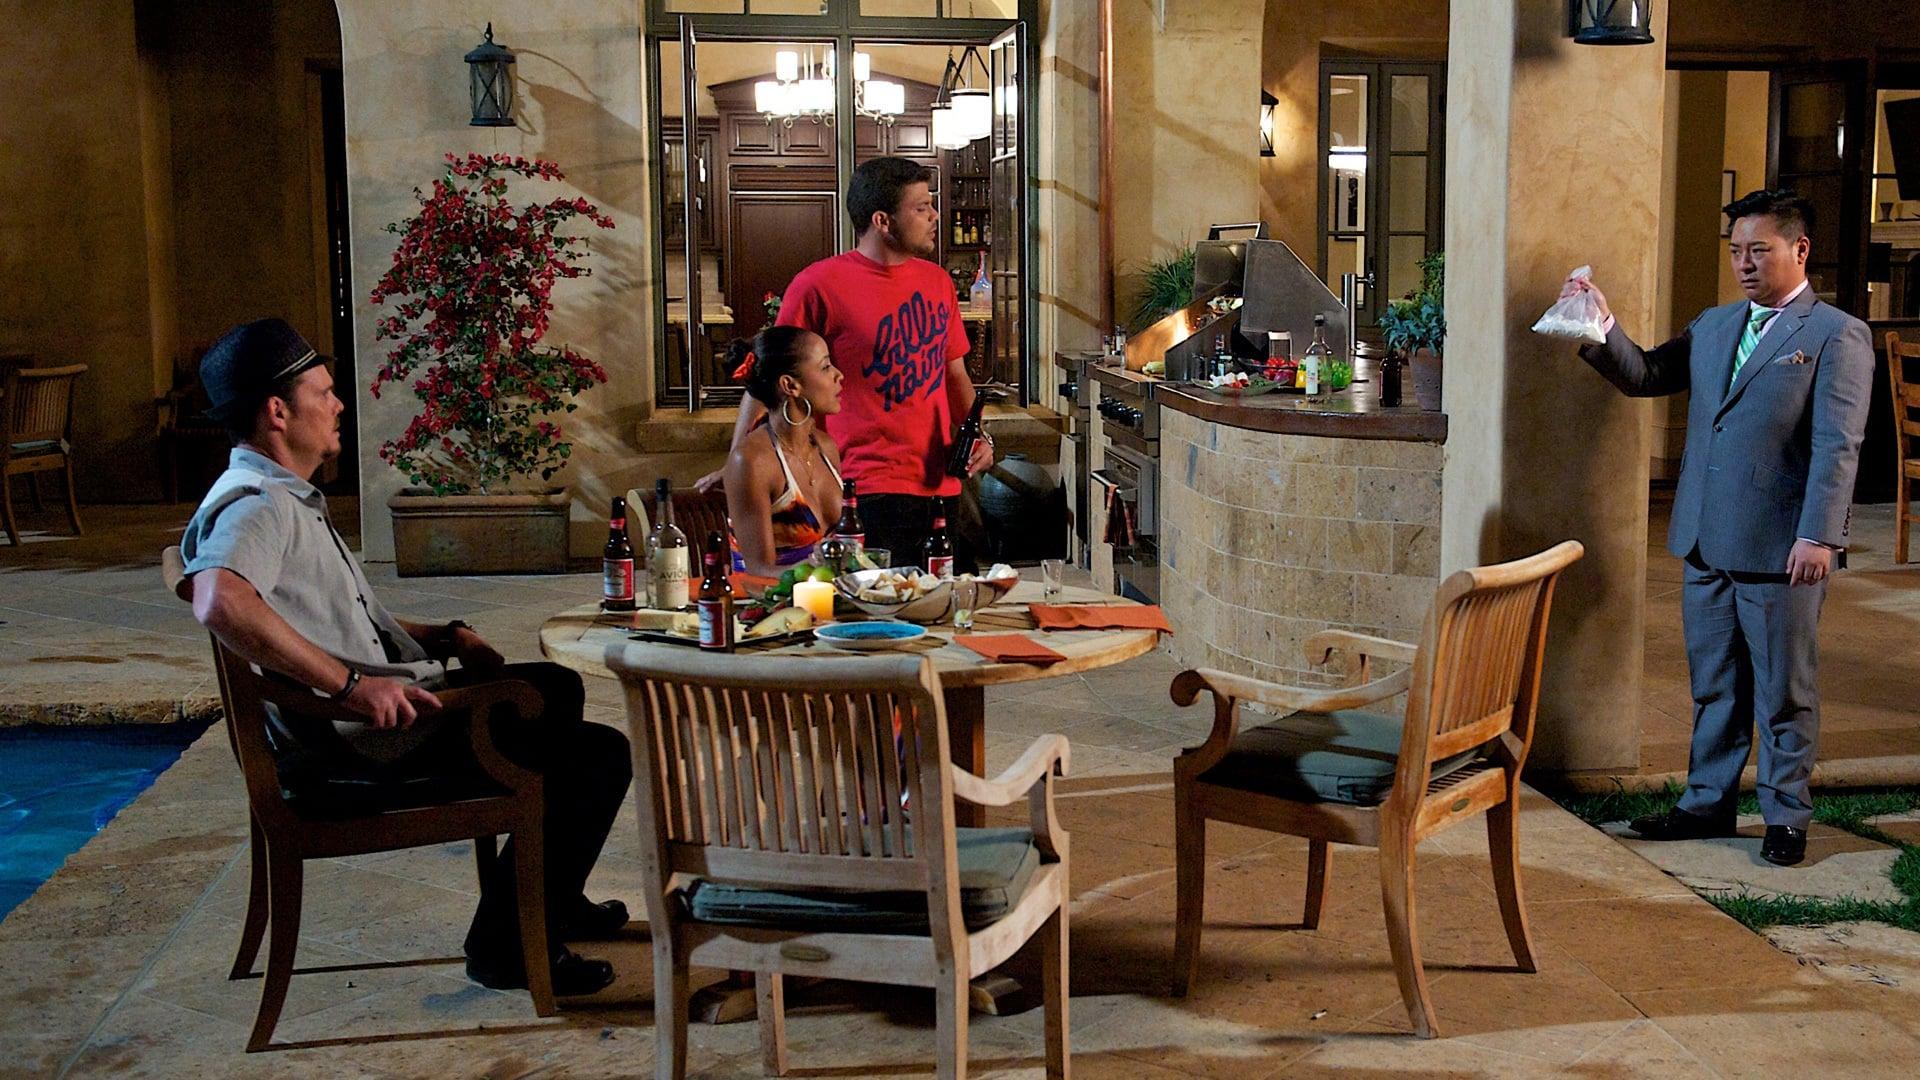 Entourage Porn Scenes From An Italian Restaurant 2010 - Backdrops  Stills  The -4068